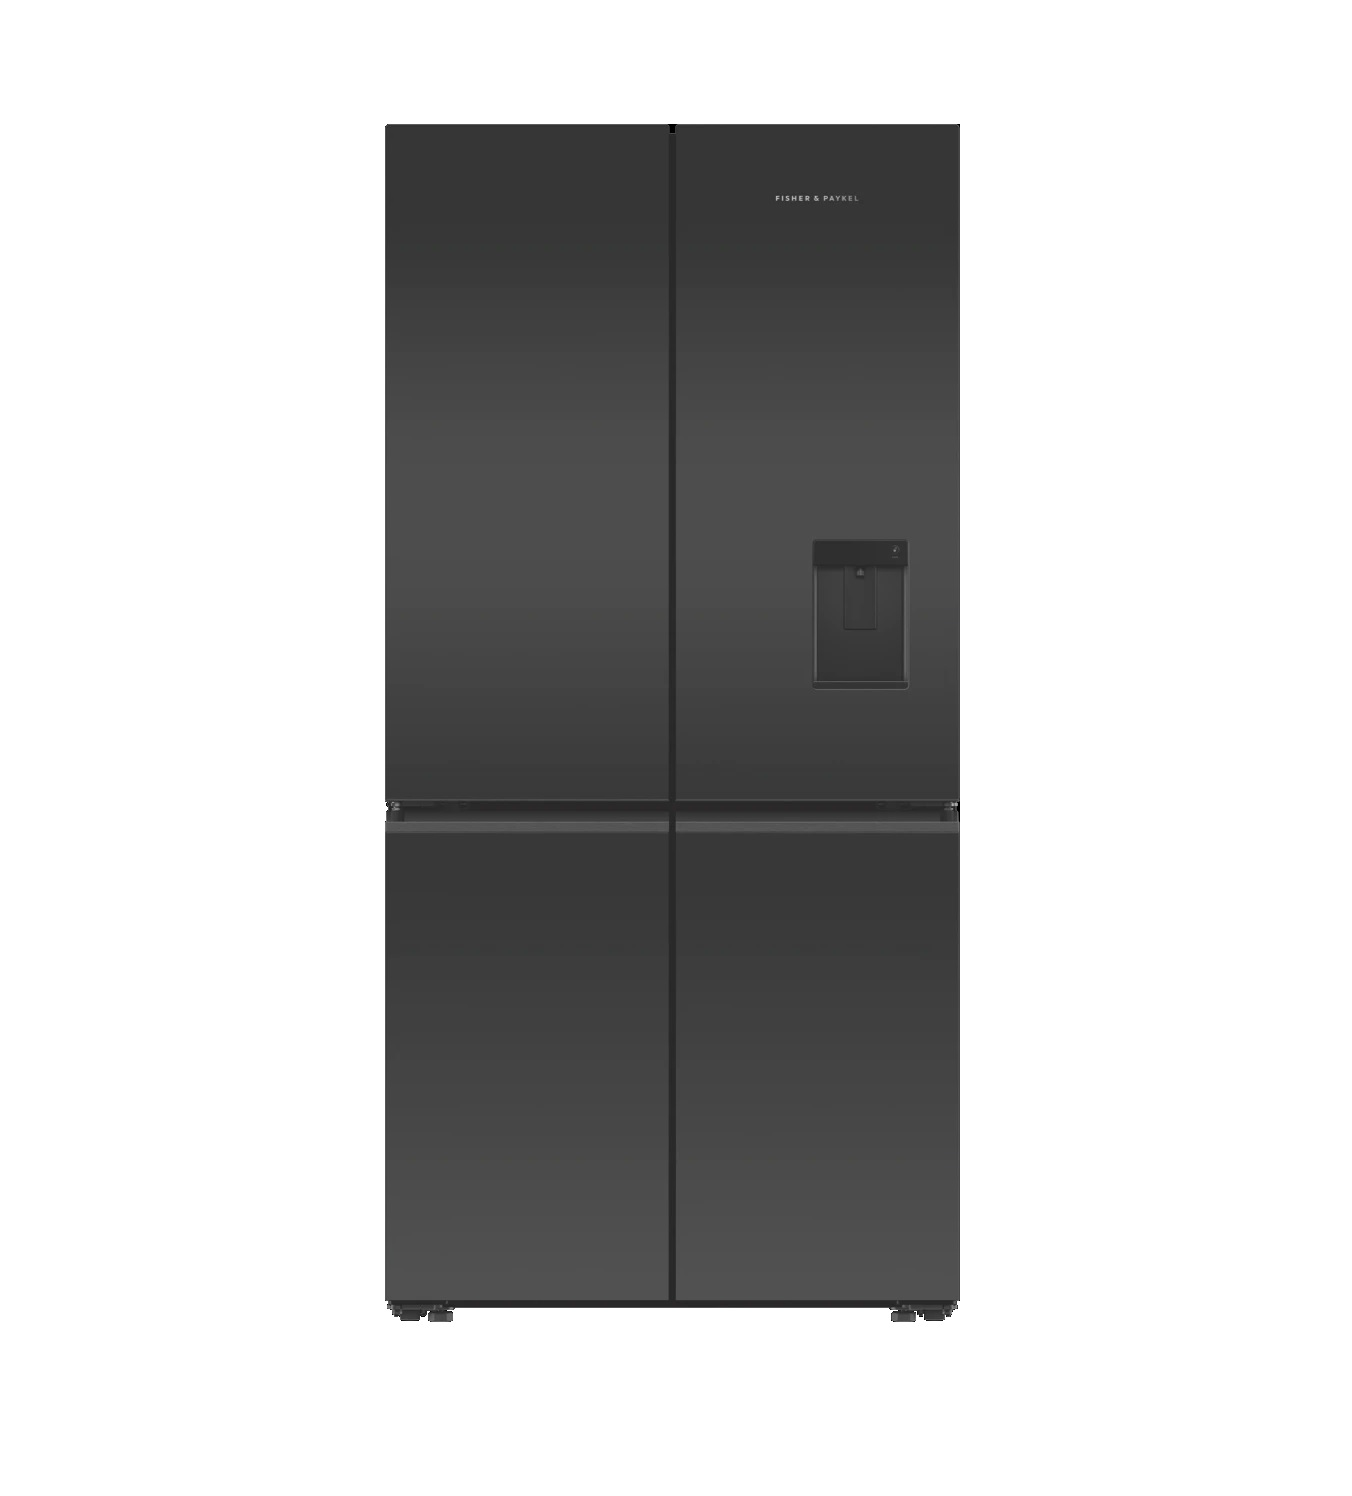 Fisher & Paykel RF730QZUVB1 Refrigerator